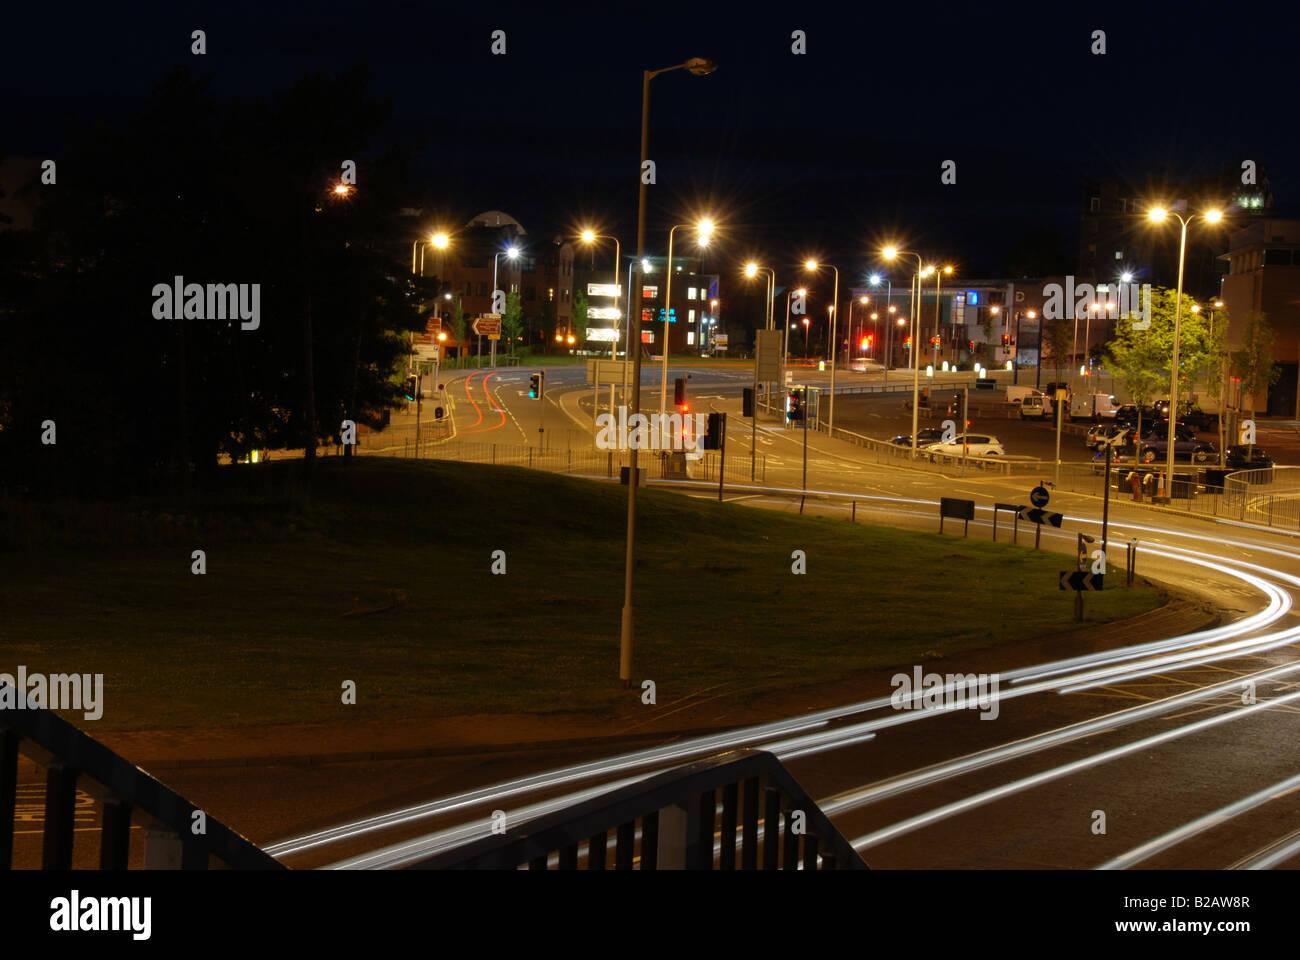 Dundee riverside roundbout night shot long exposure - Stock Image